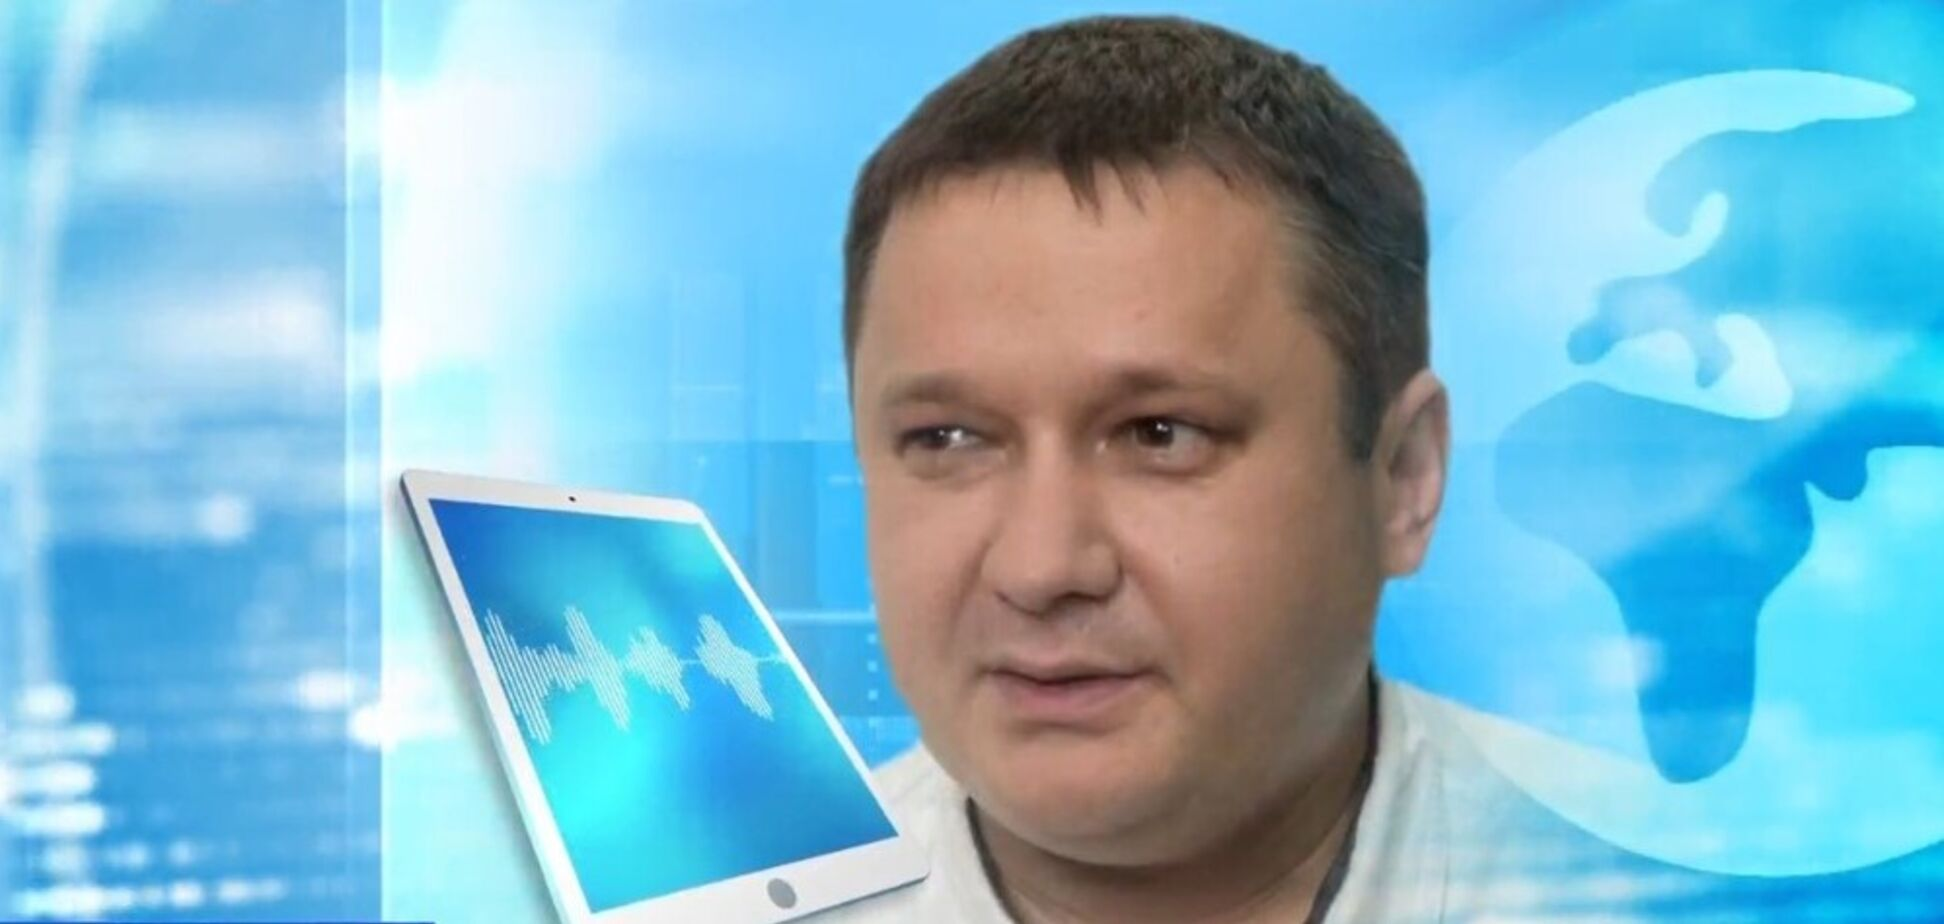 Сотрудники аппарата партии 'Слуга народа' работают в тени: эксперт прокомментировал скандал